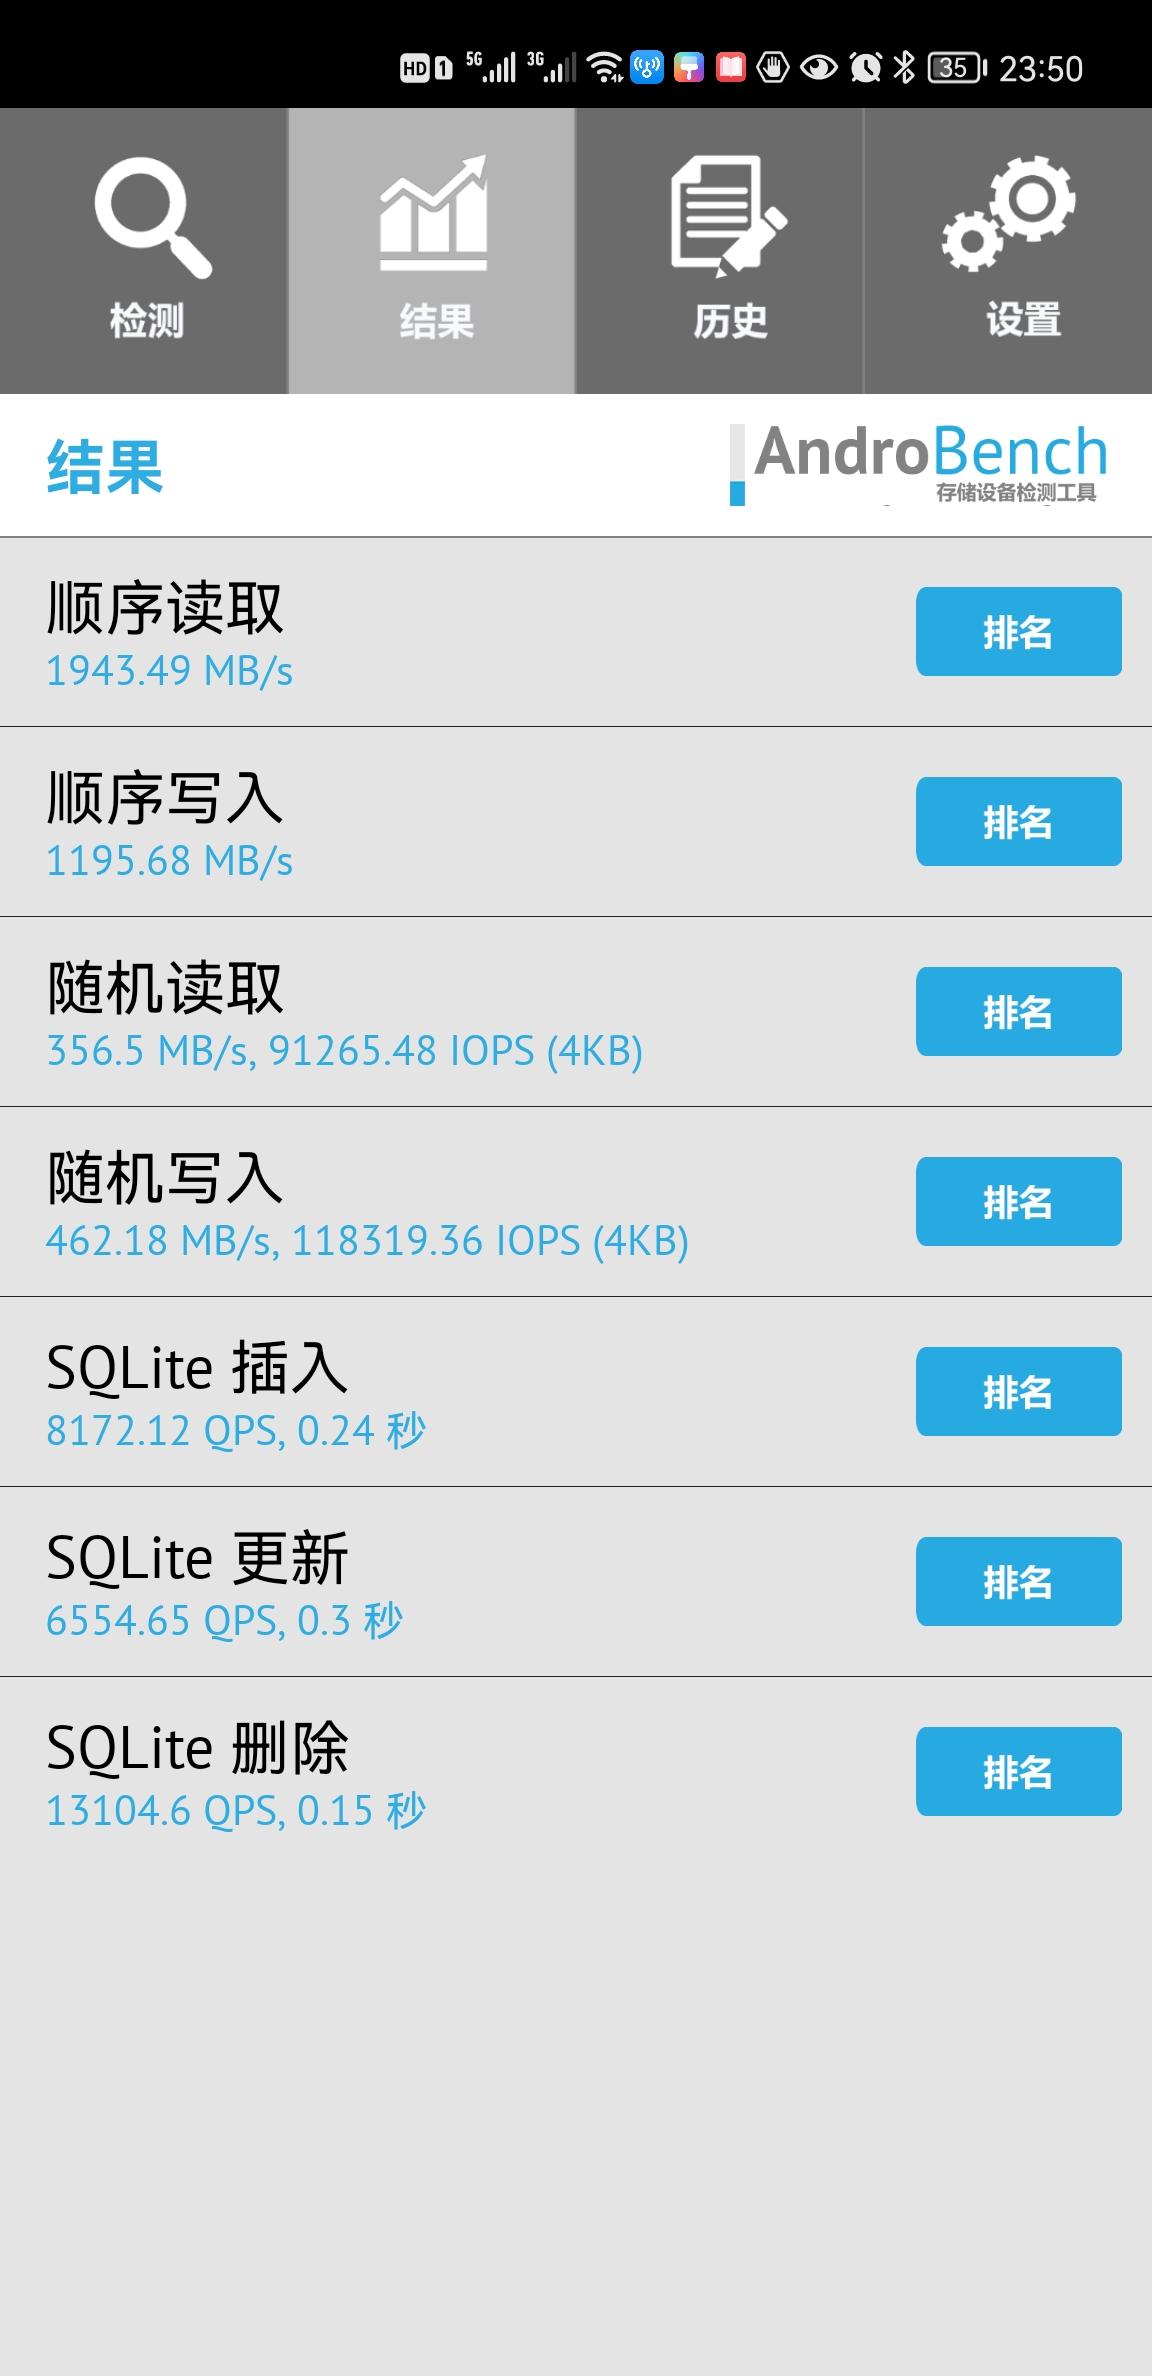 Screenshot_20211014_235026_com.andromeda.androbench2.jpg